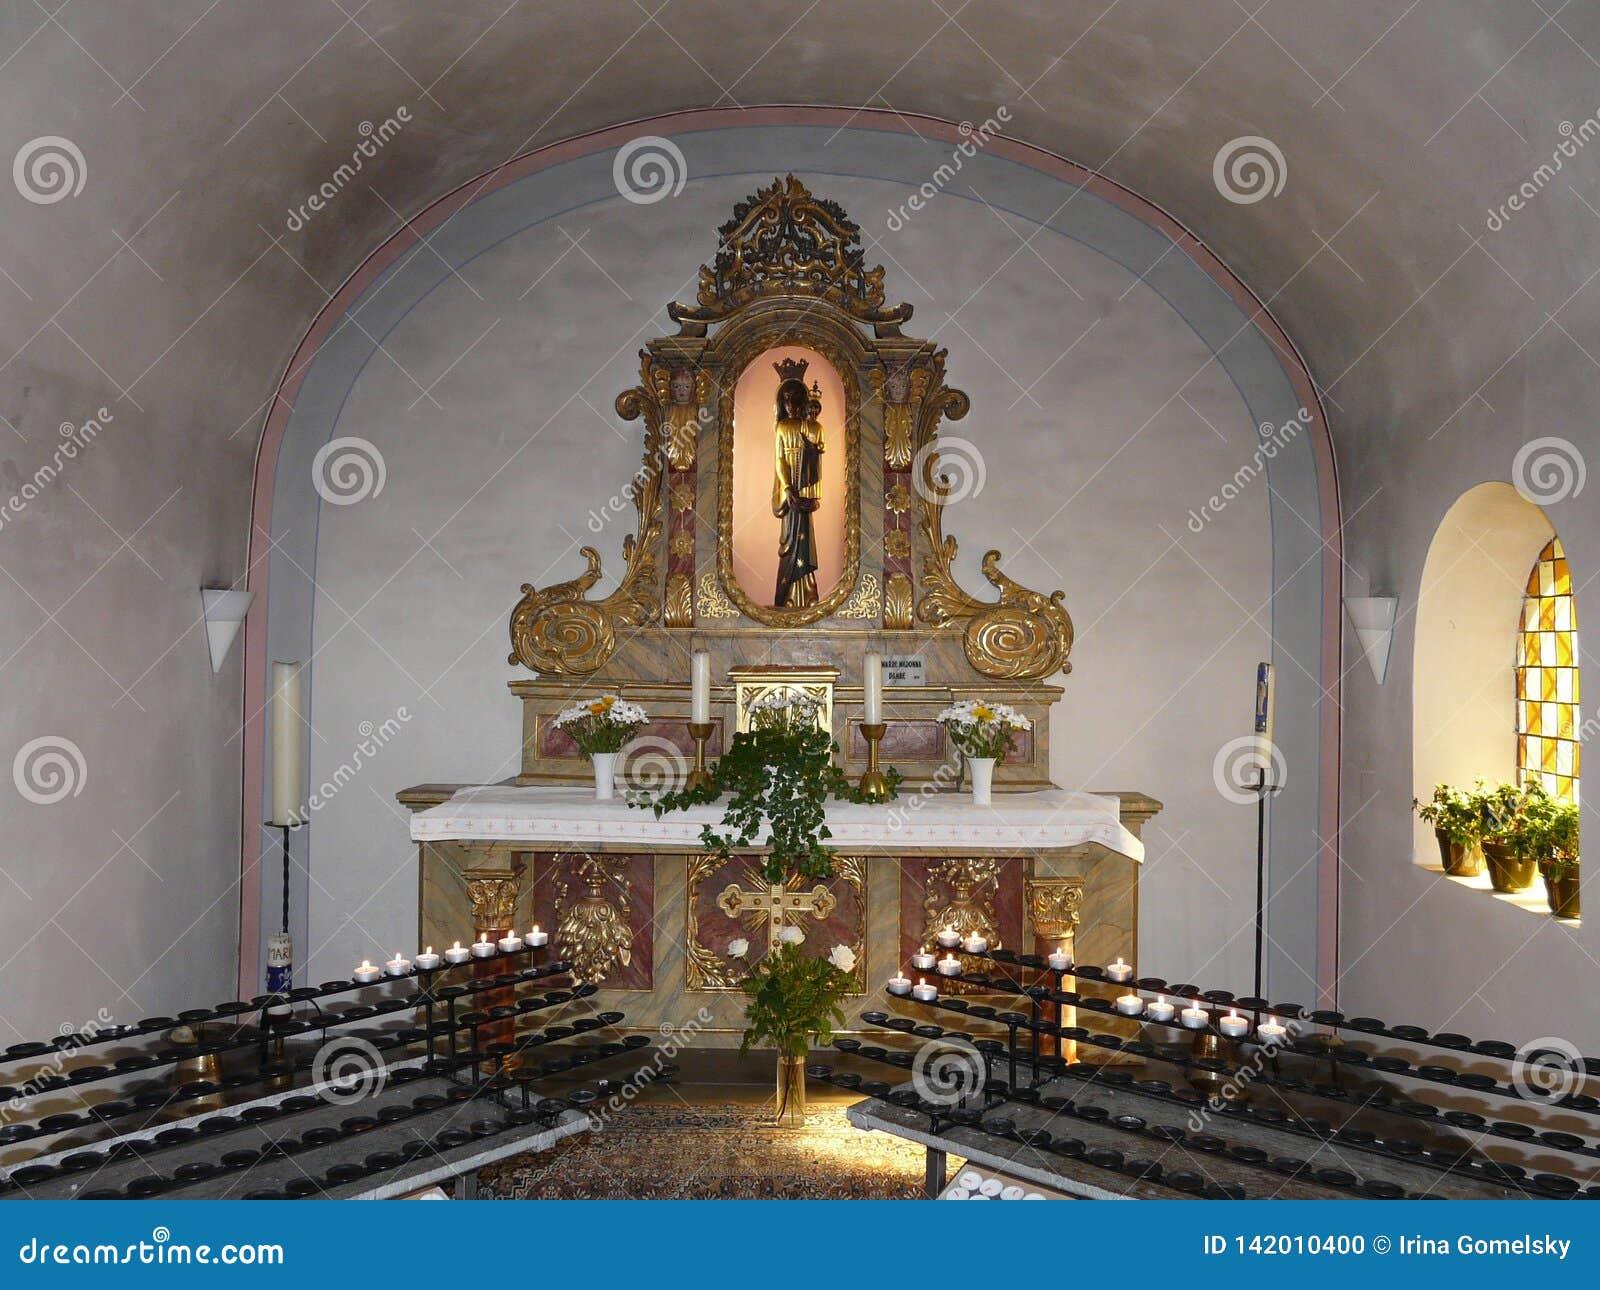 Interior of the Carmelite Church in Beilstein, Rhineland-Palatinate, Germany